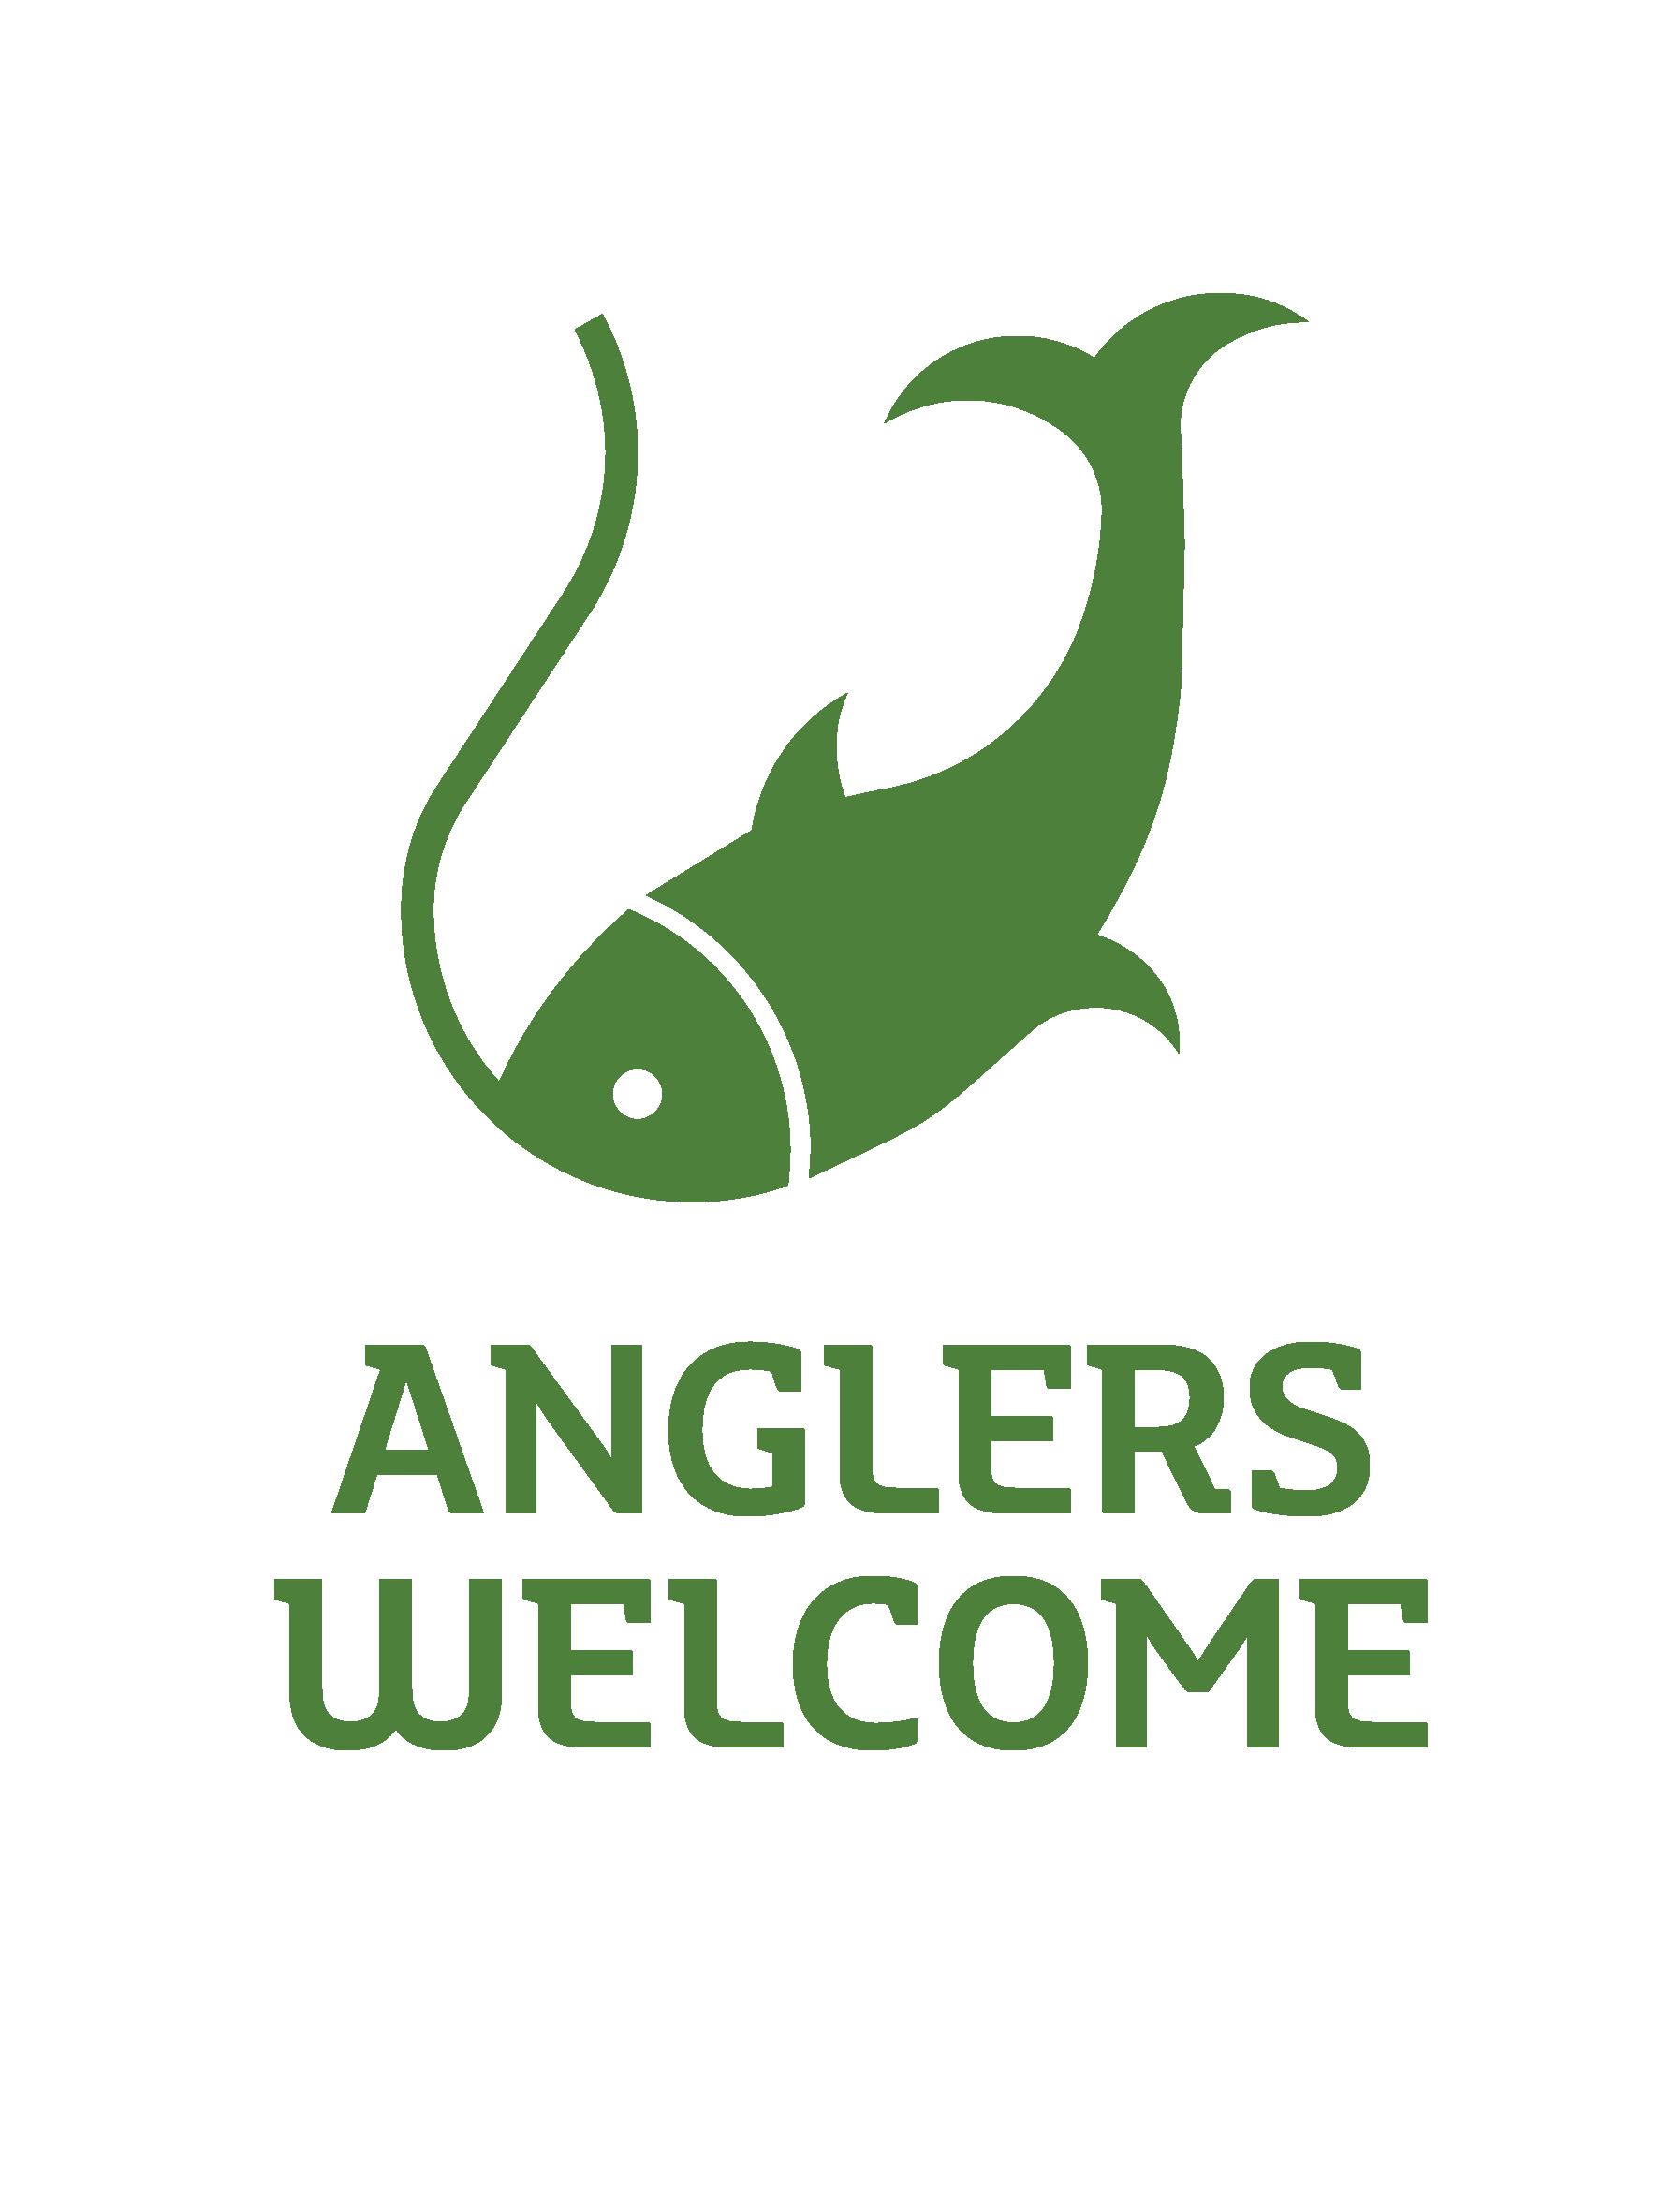 Anglers welcome.jpg